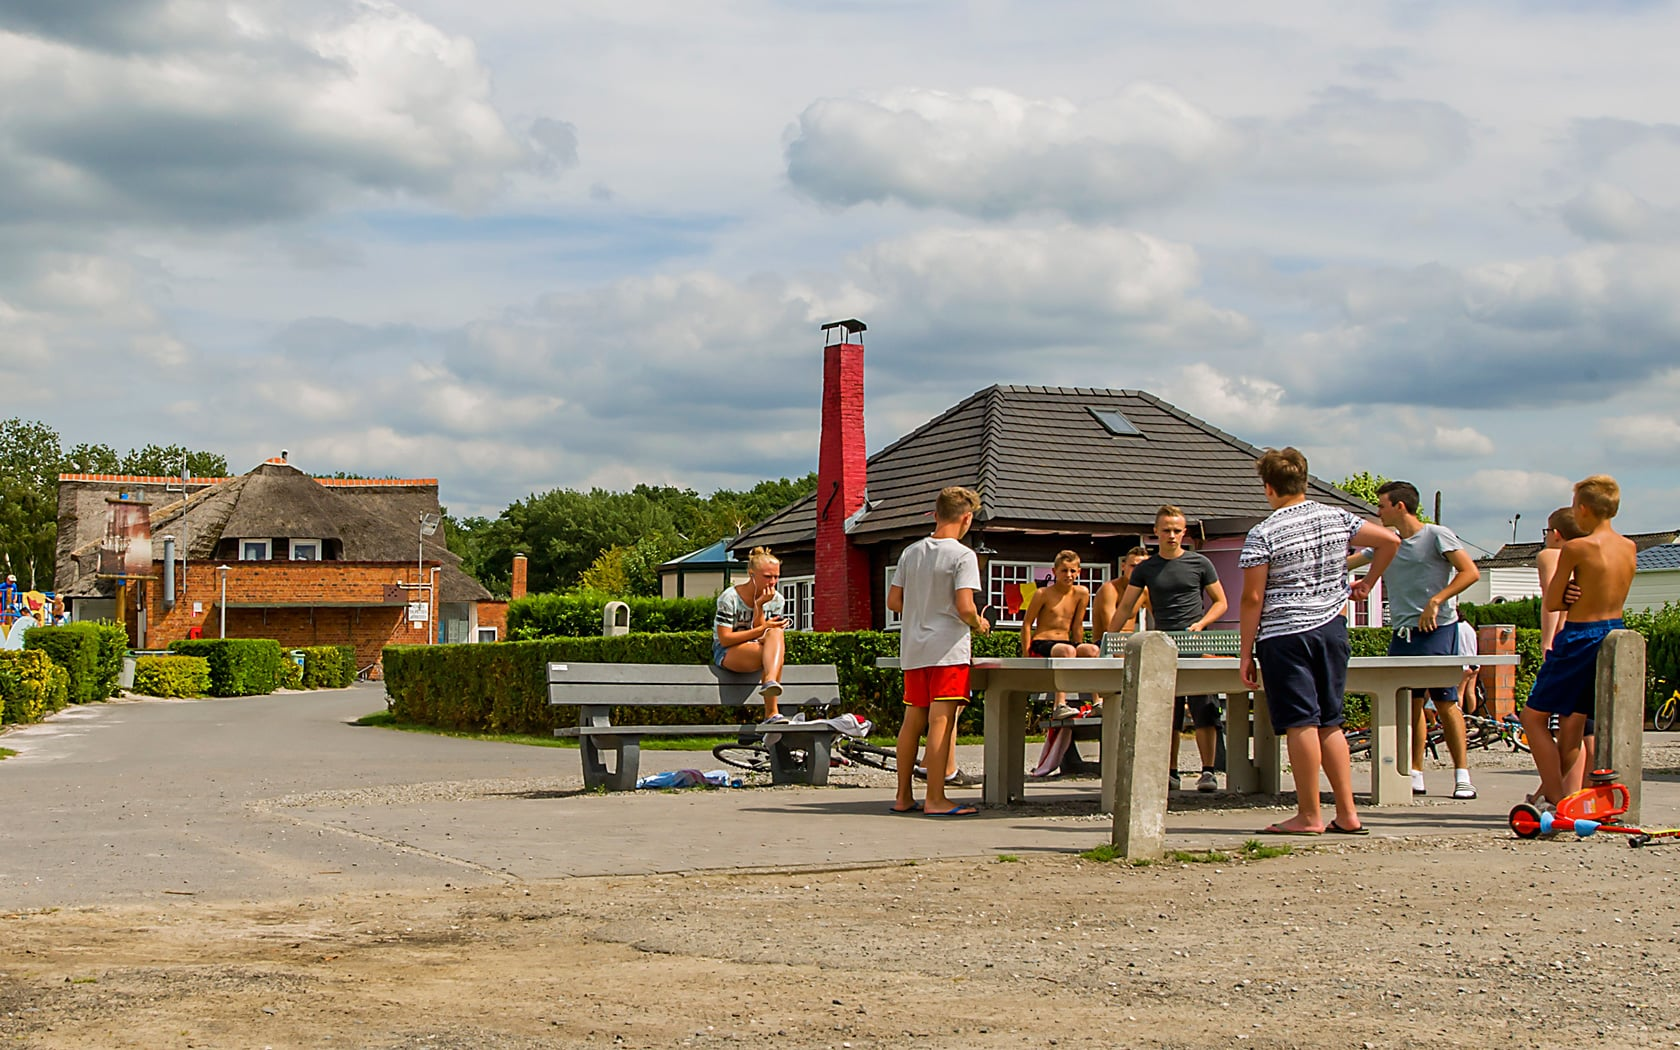 camping-diepvennen_home_DSC3214_20150722